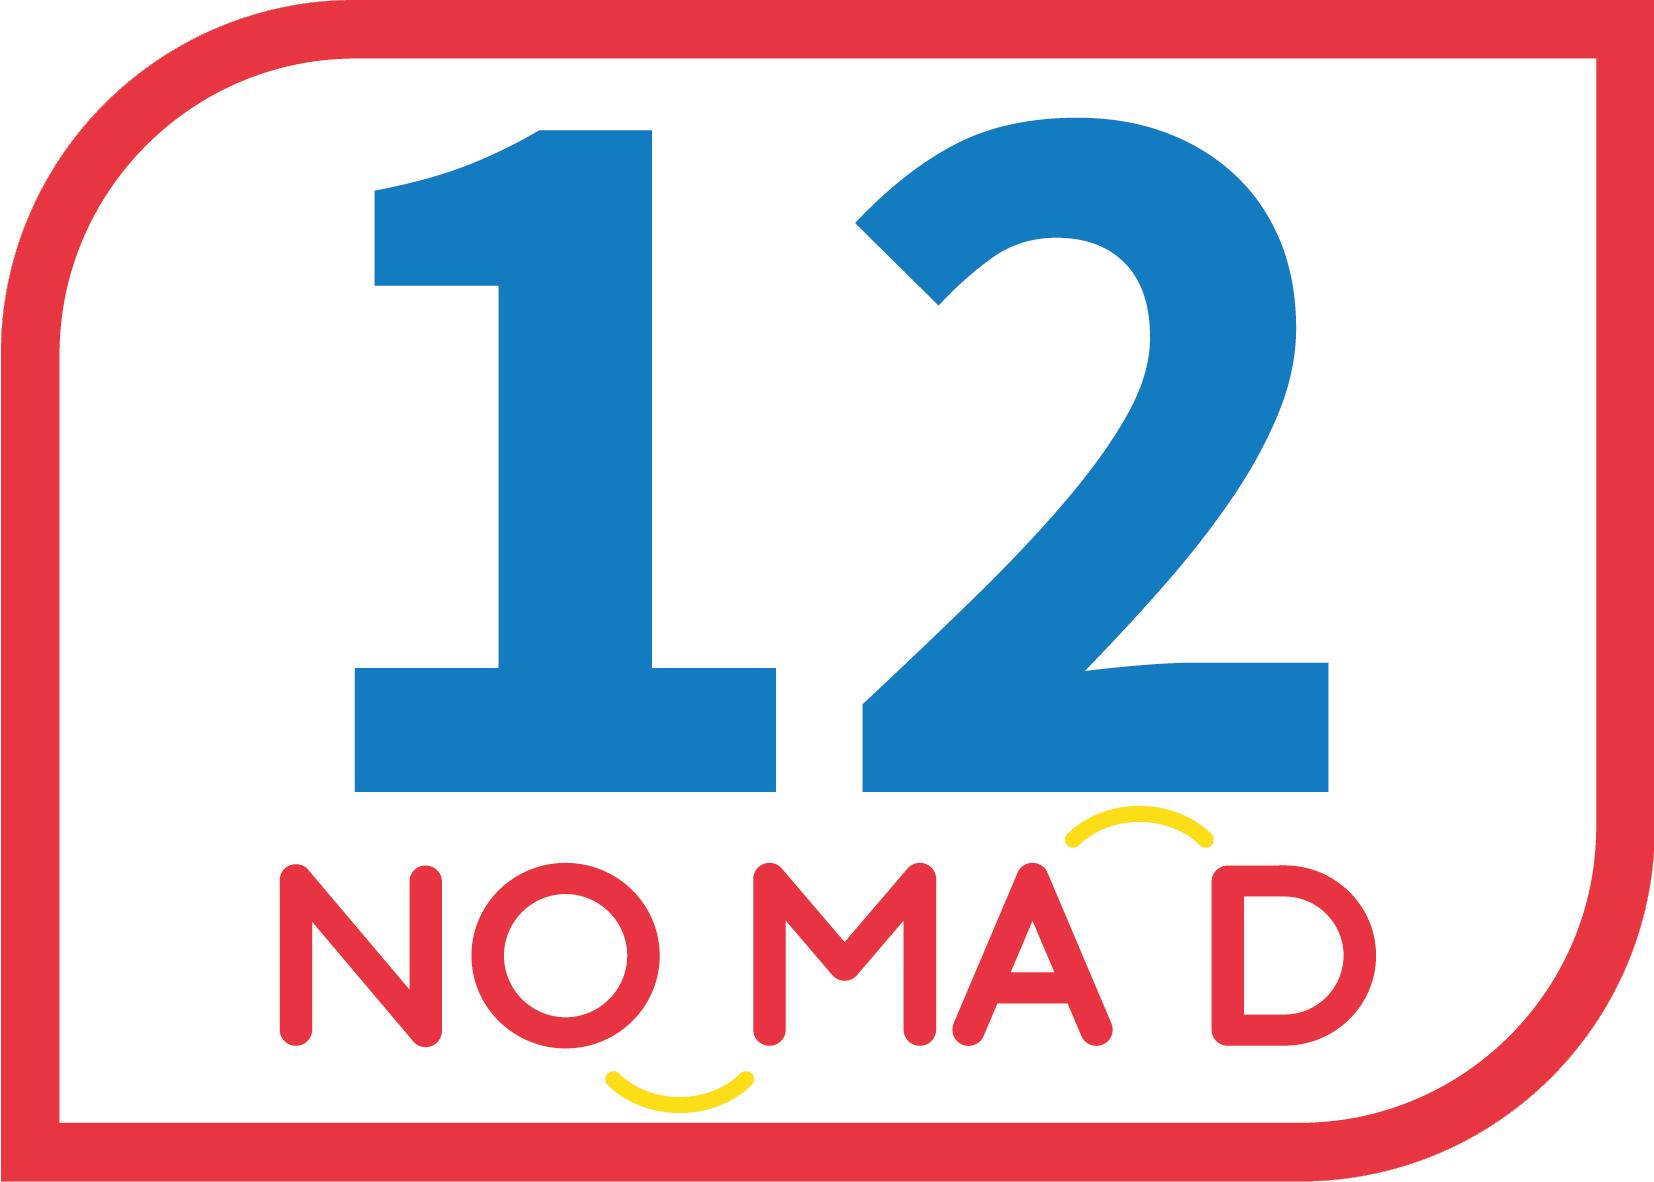 Nomad 12